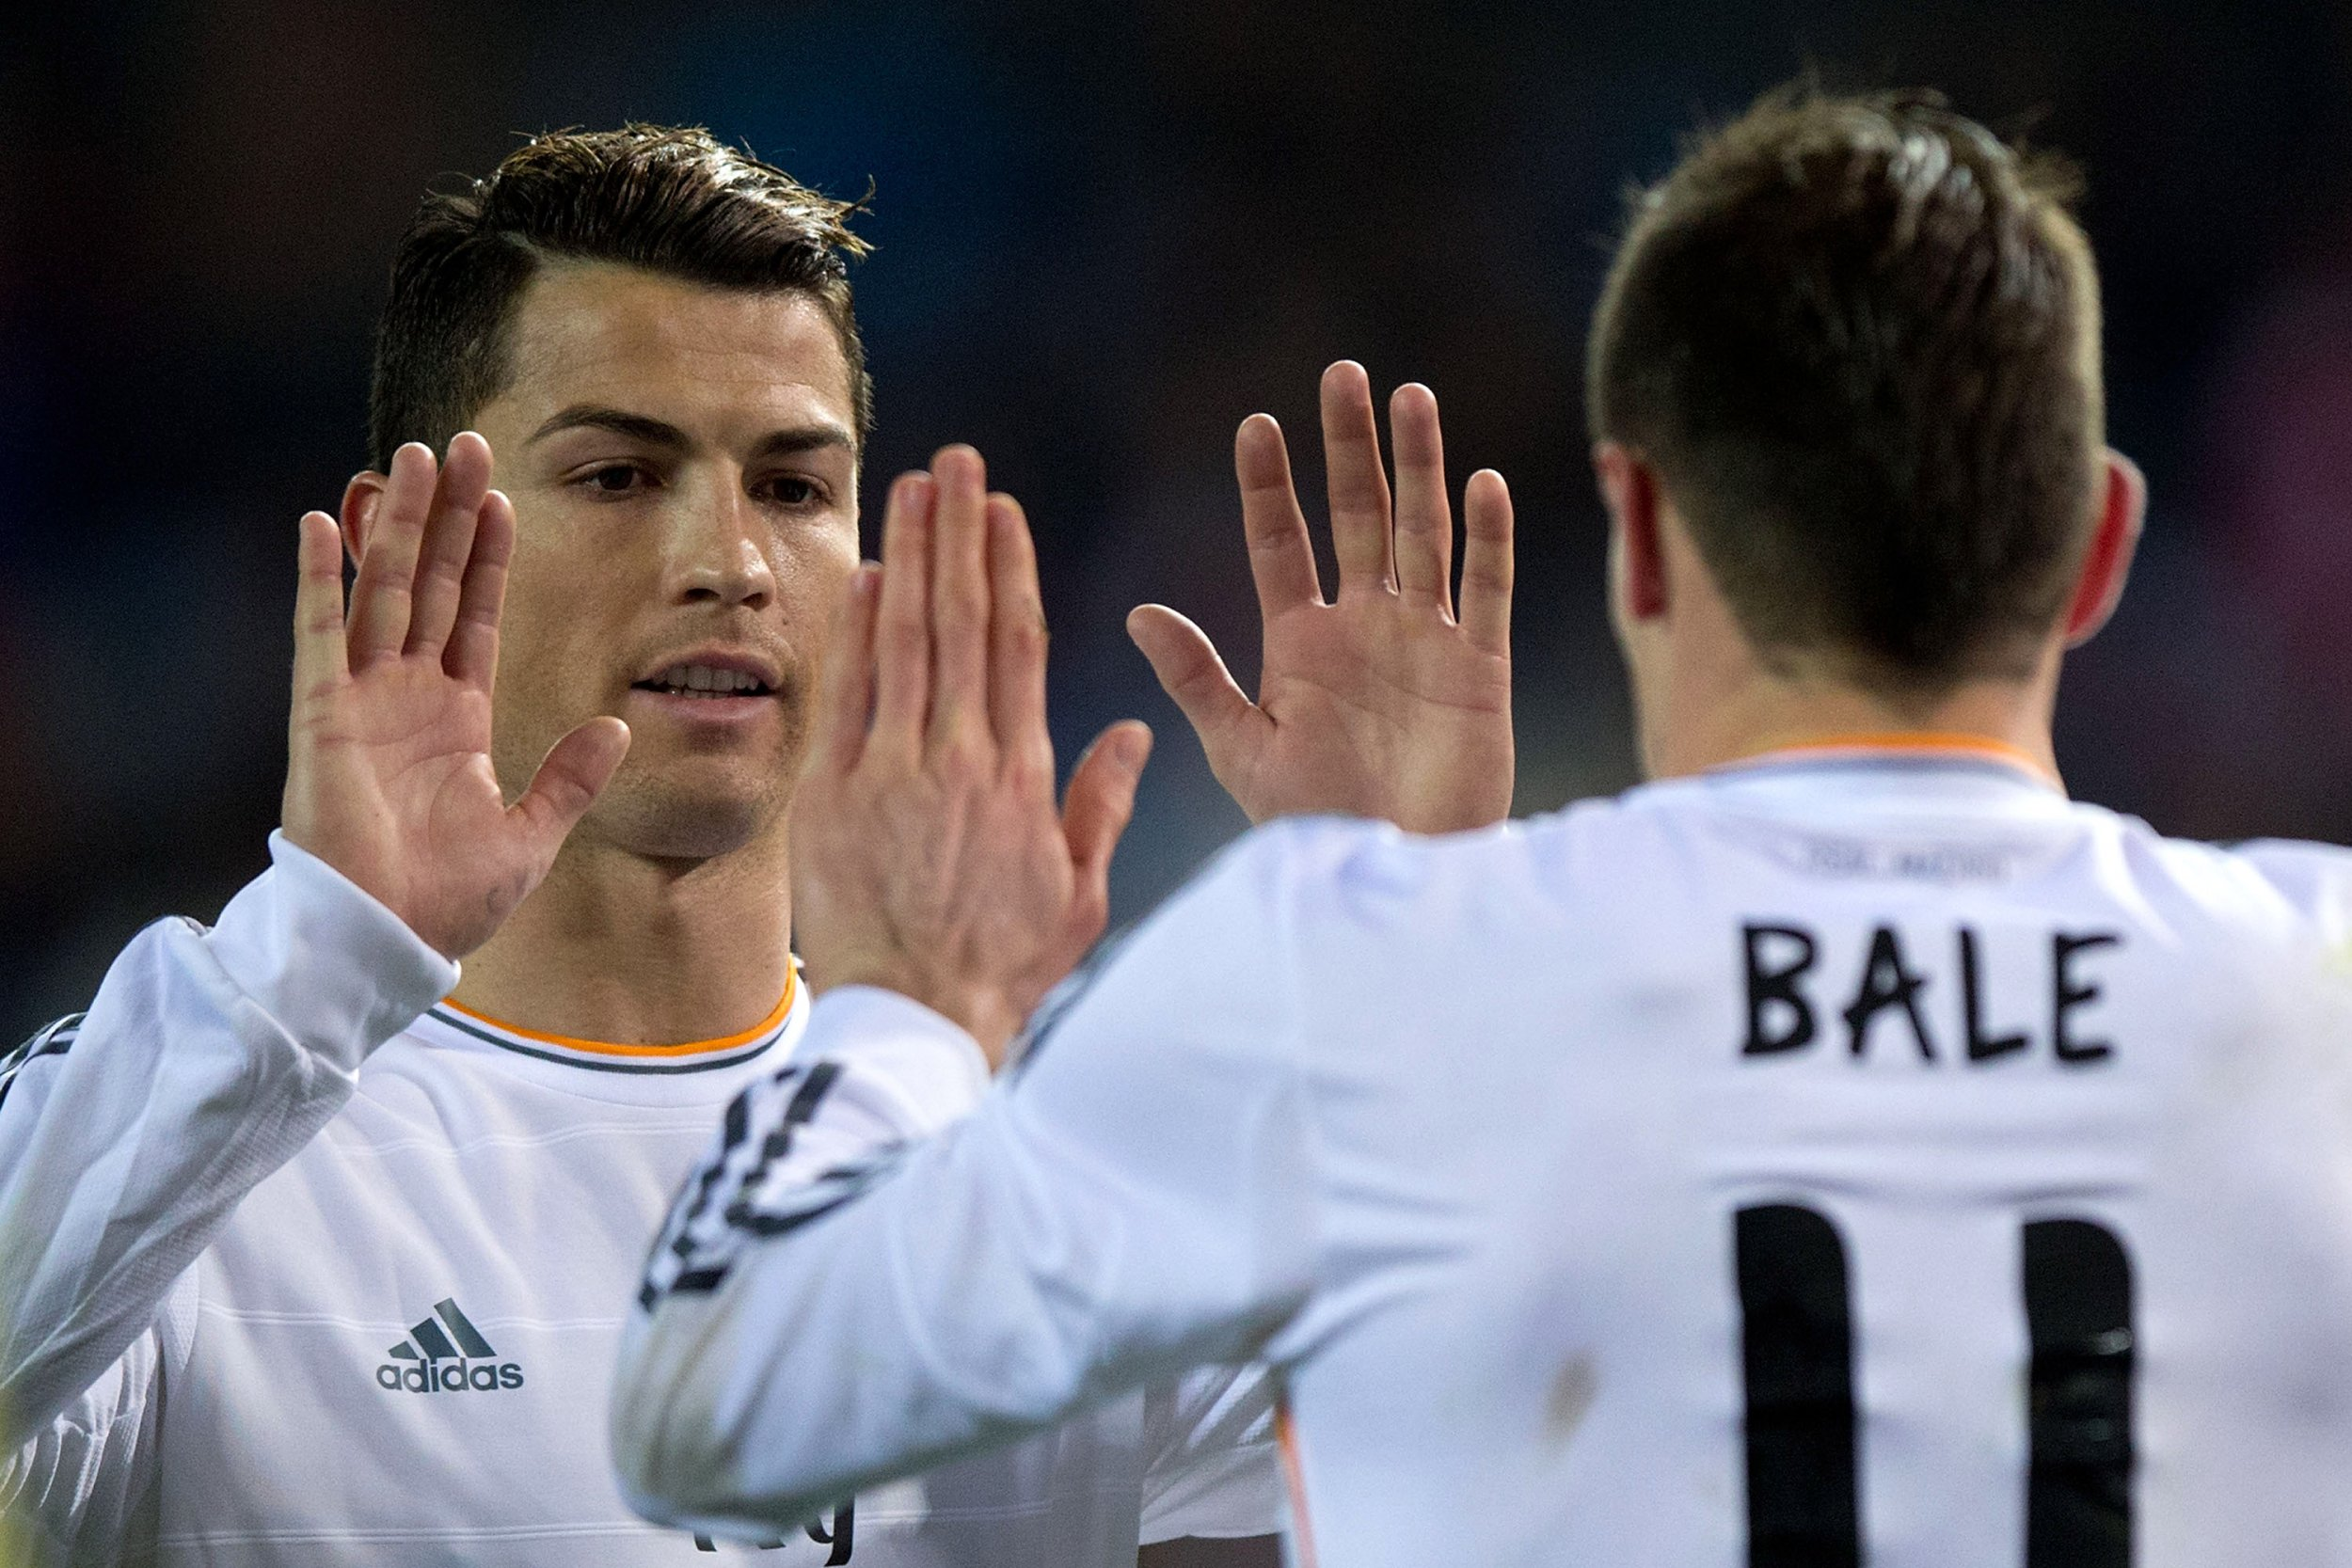 Ronaldo and Bale.